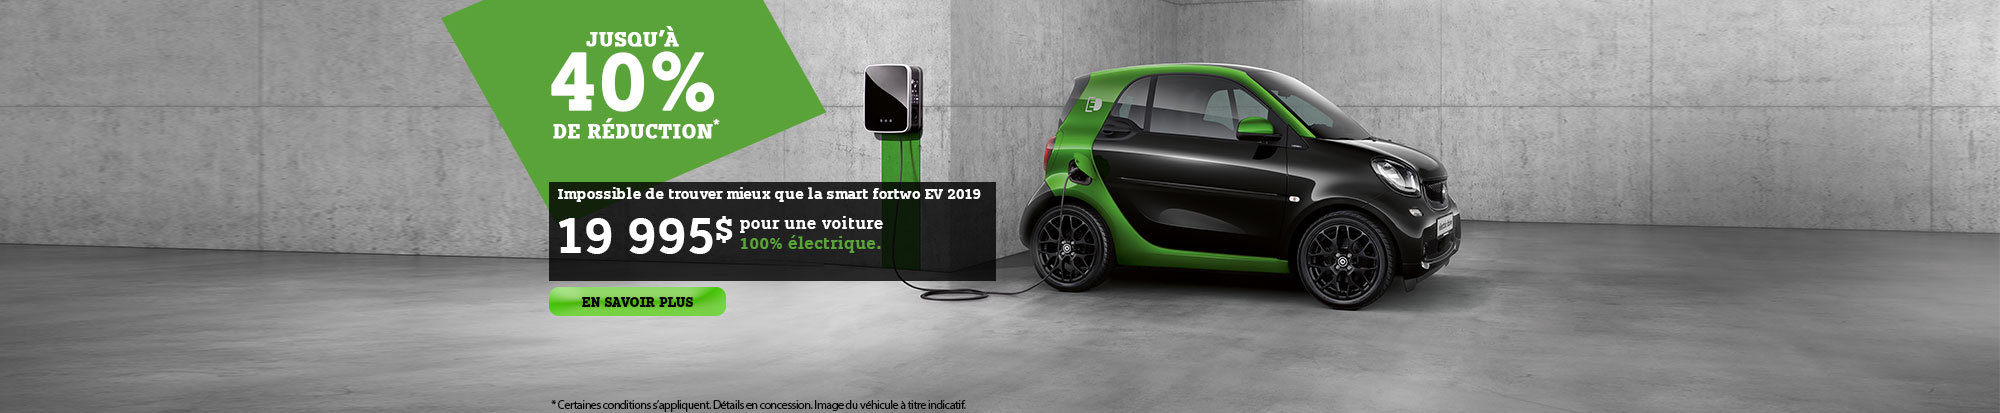 Smart fortwo EV 2019